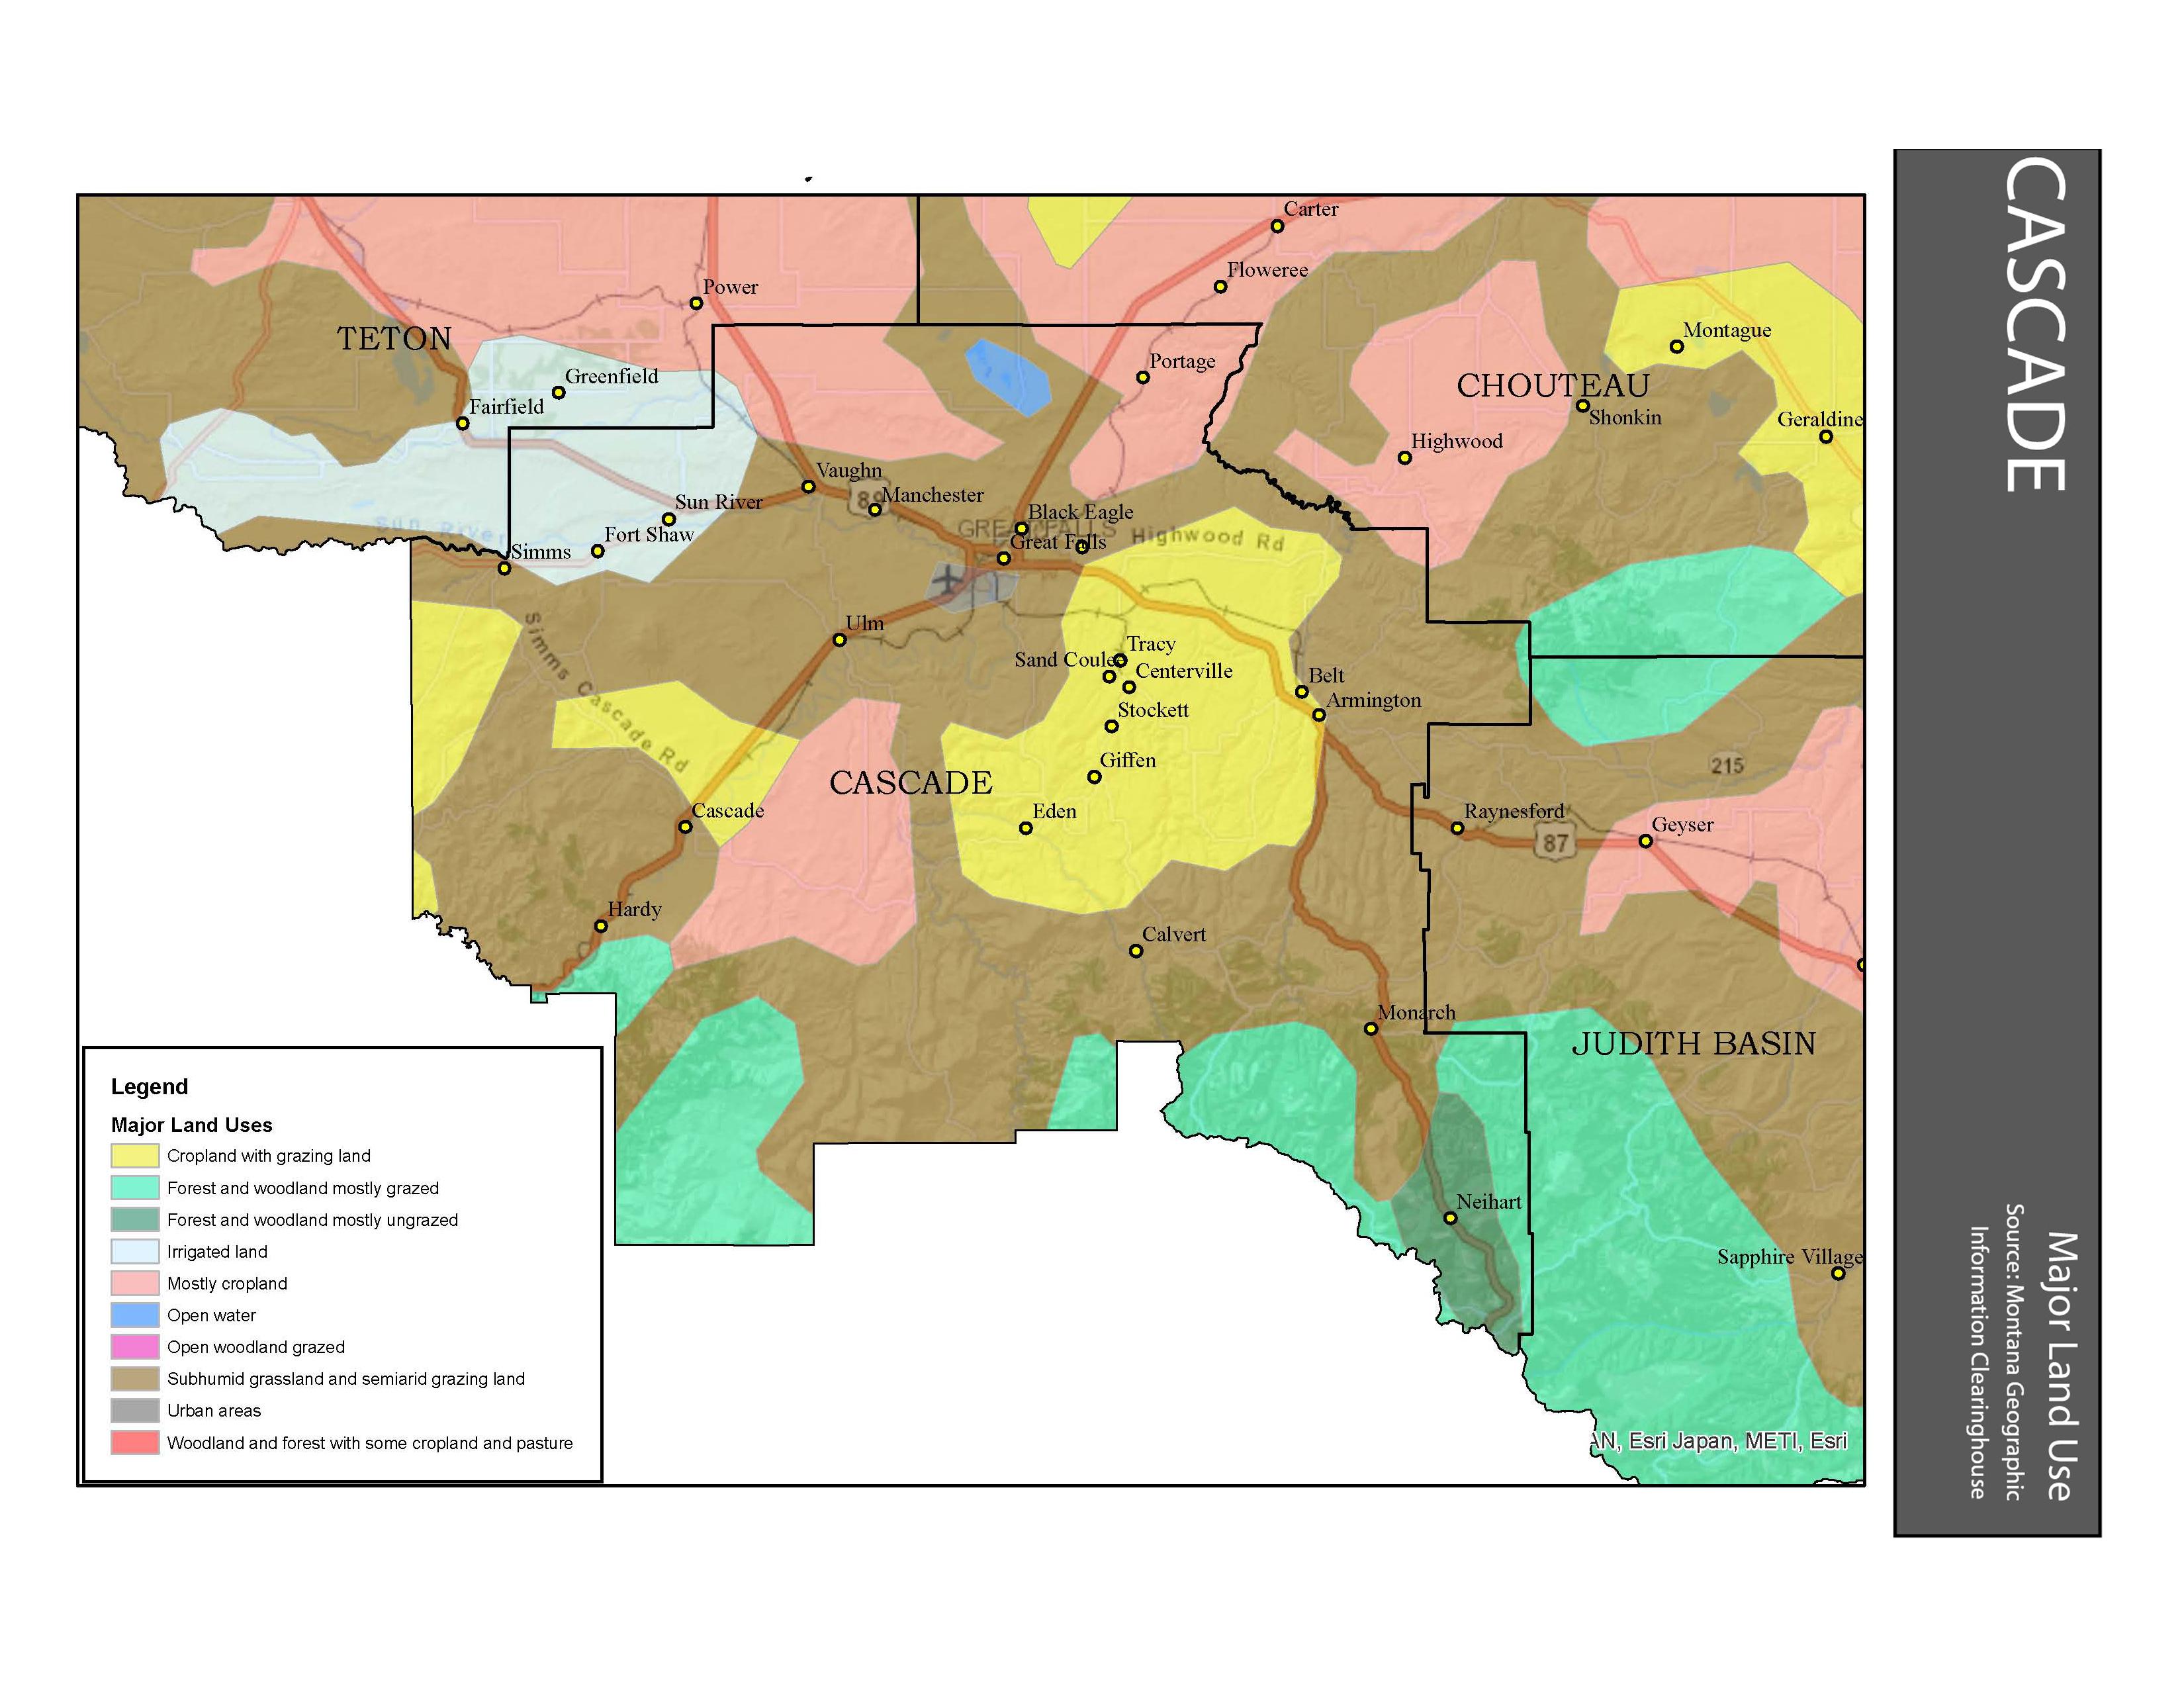 Major Land Use Cascade County